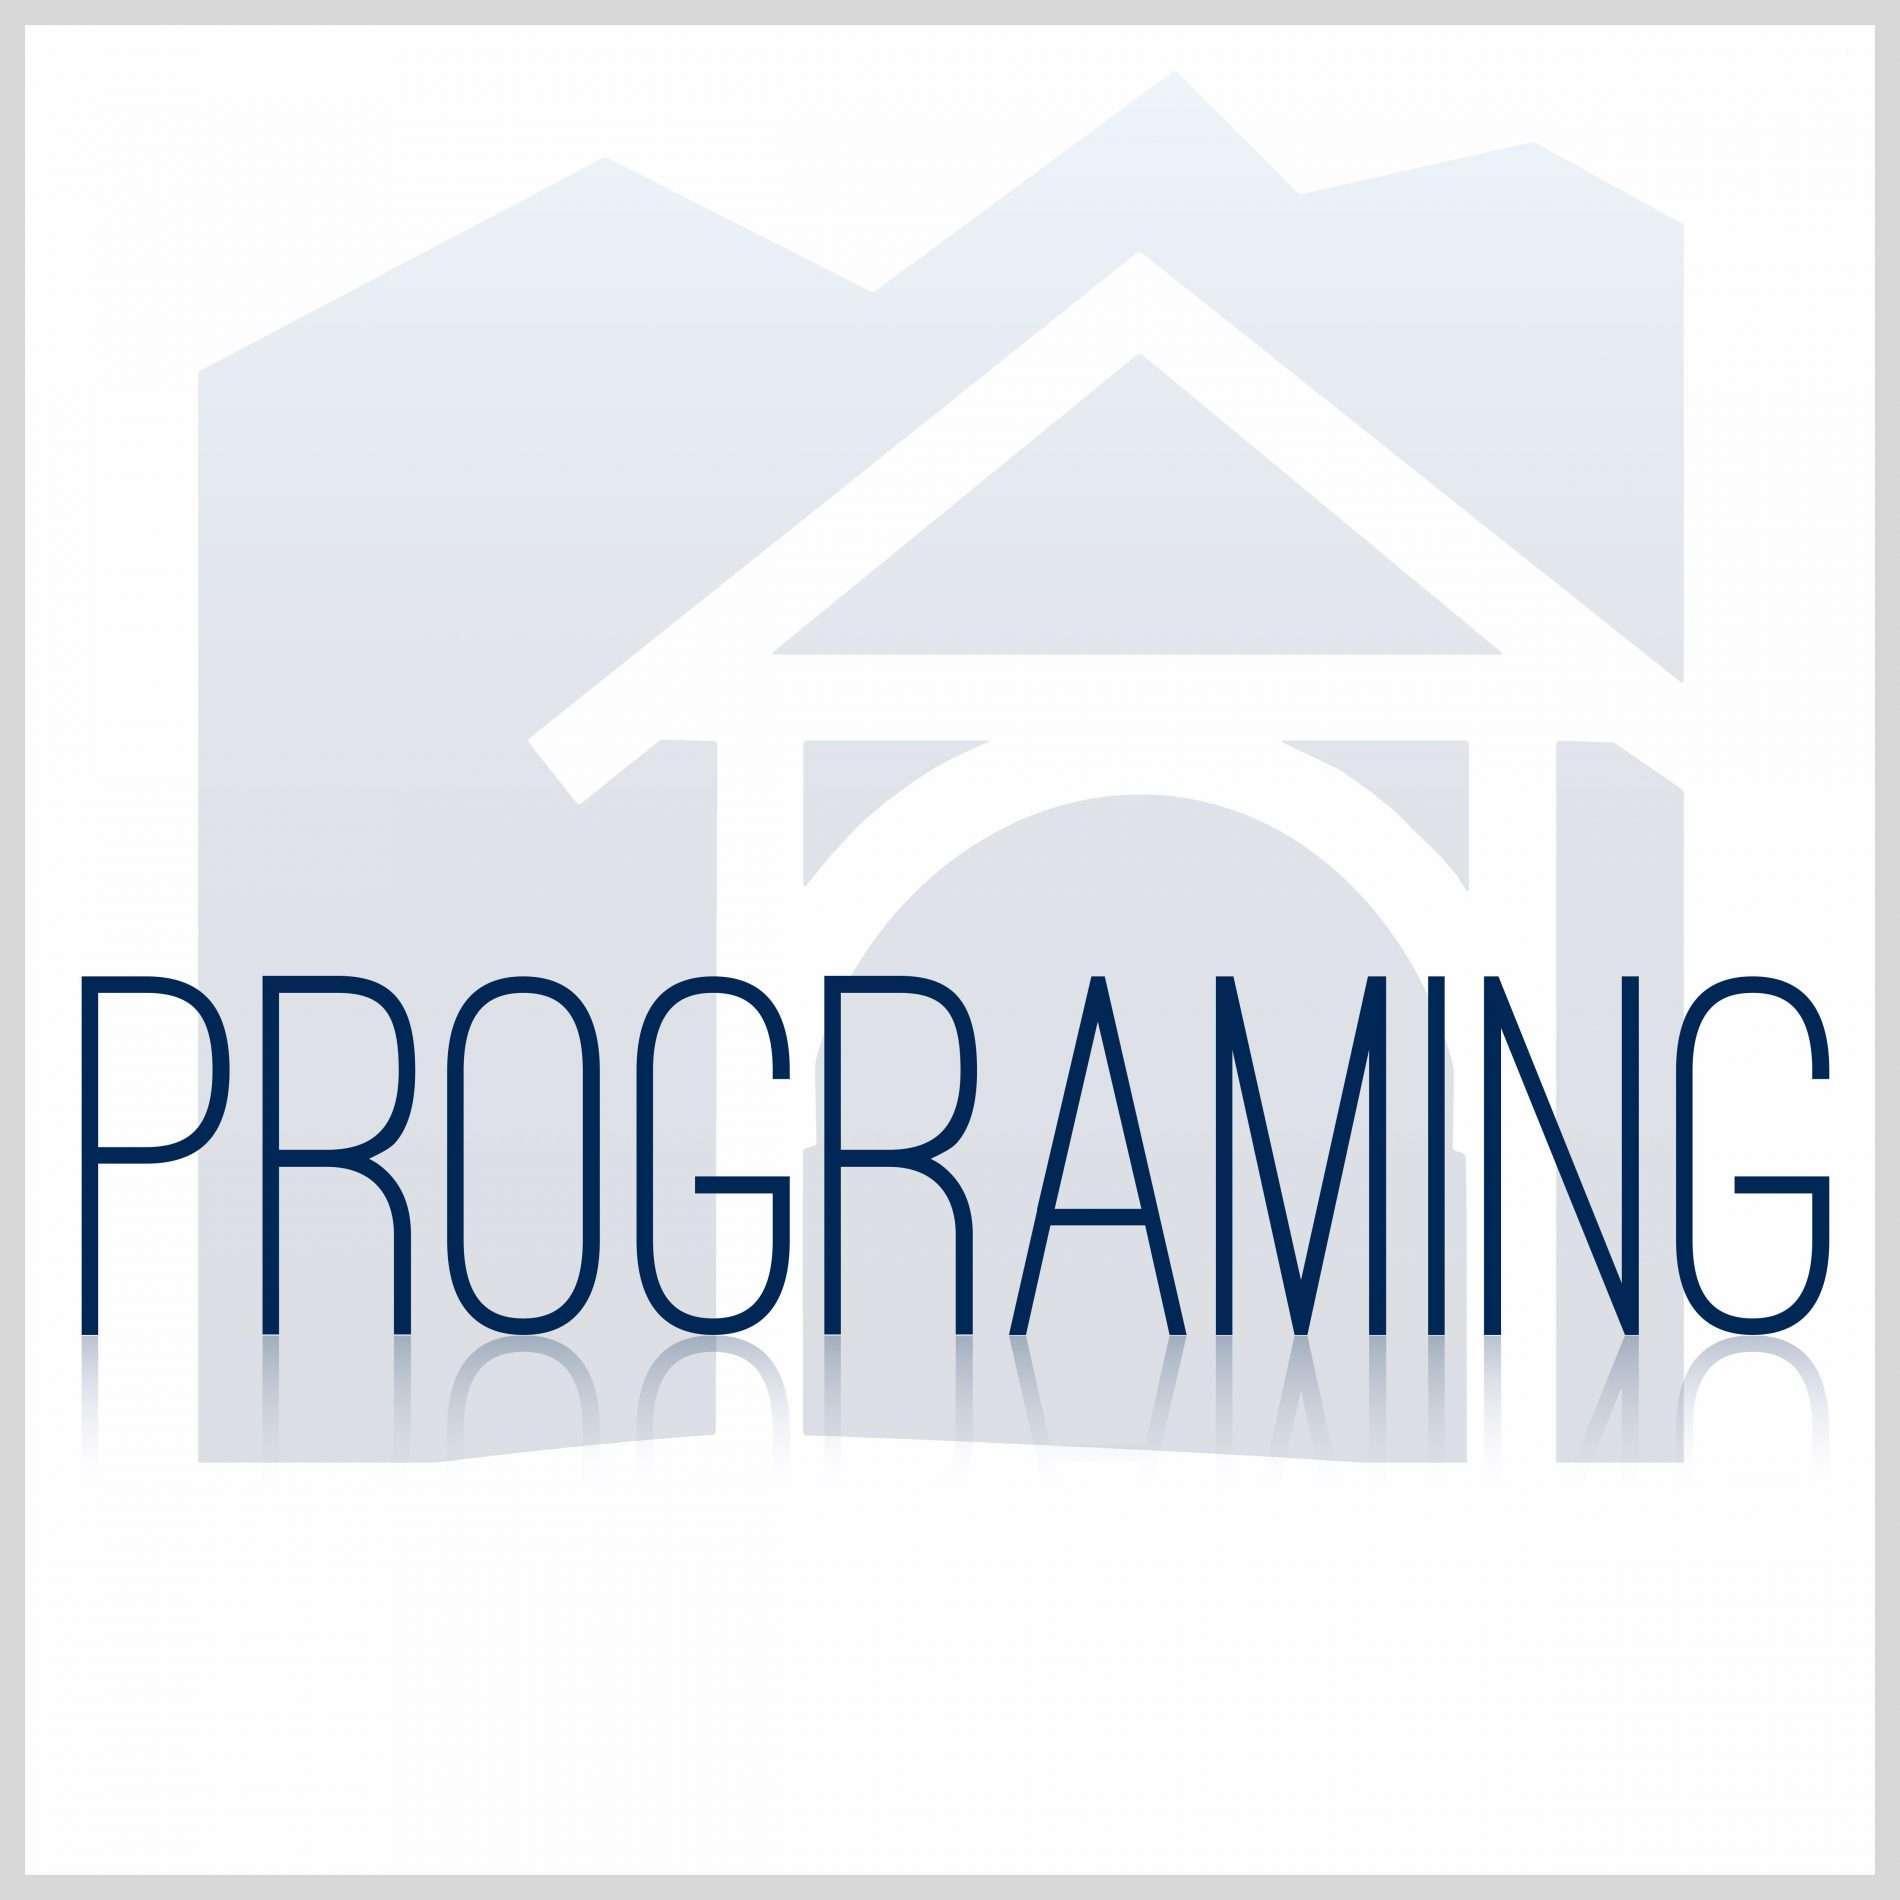 Programing